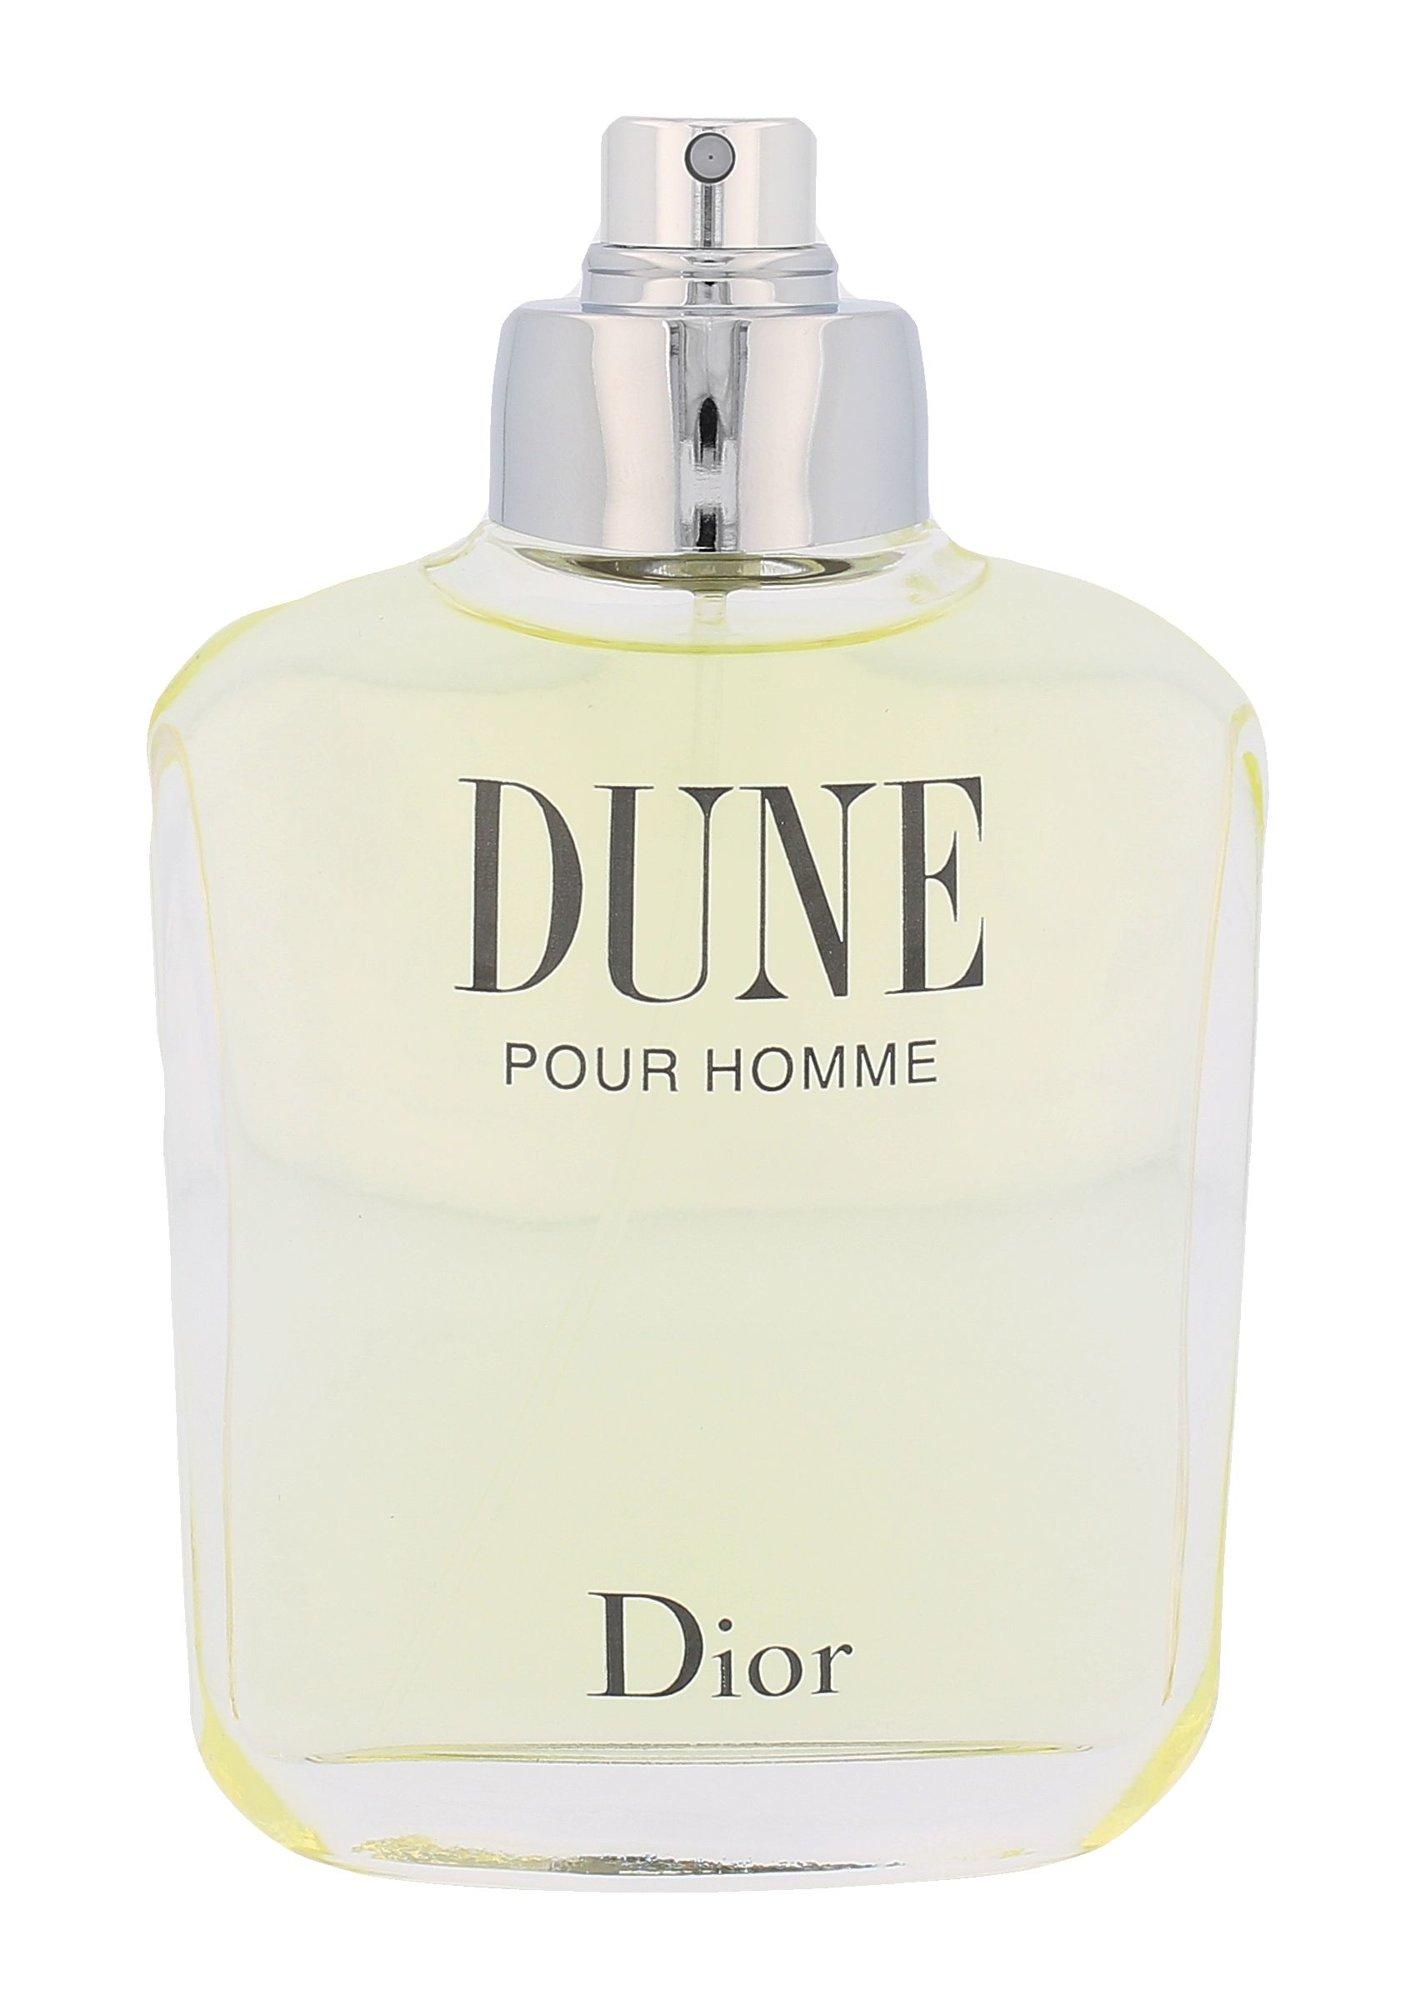 Christian Dior Dune Pour Homme, Toaletní voda 100ml, Tester